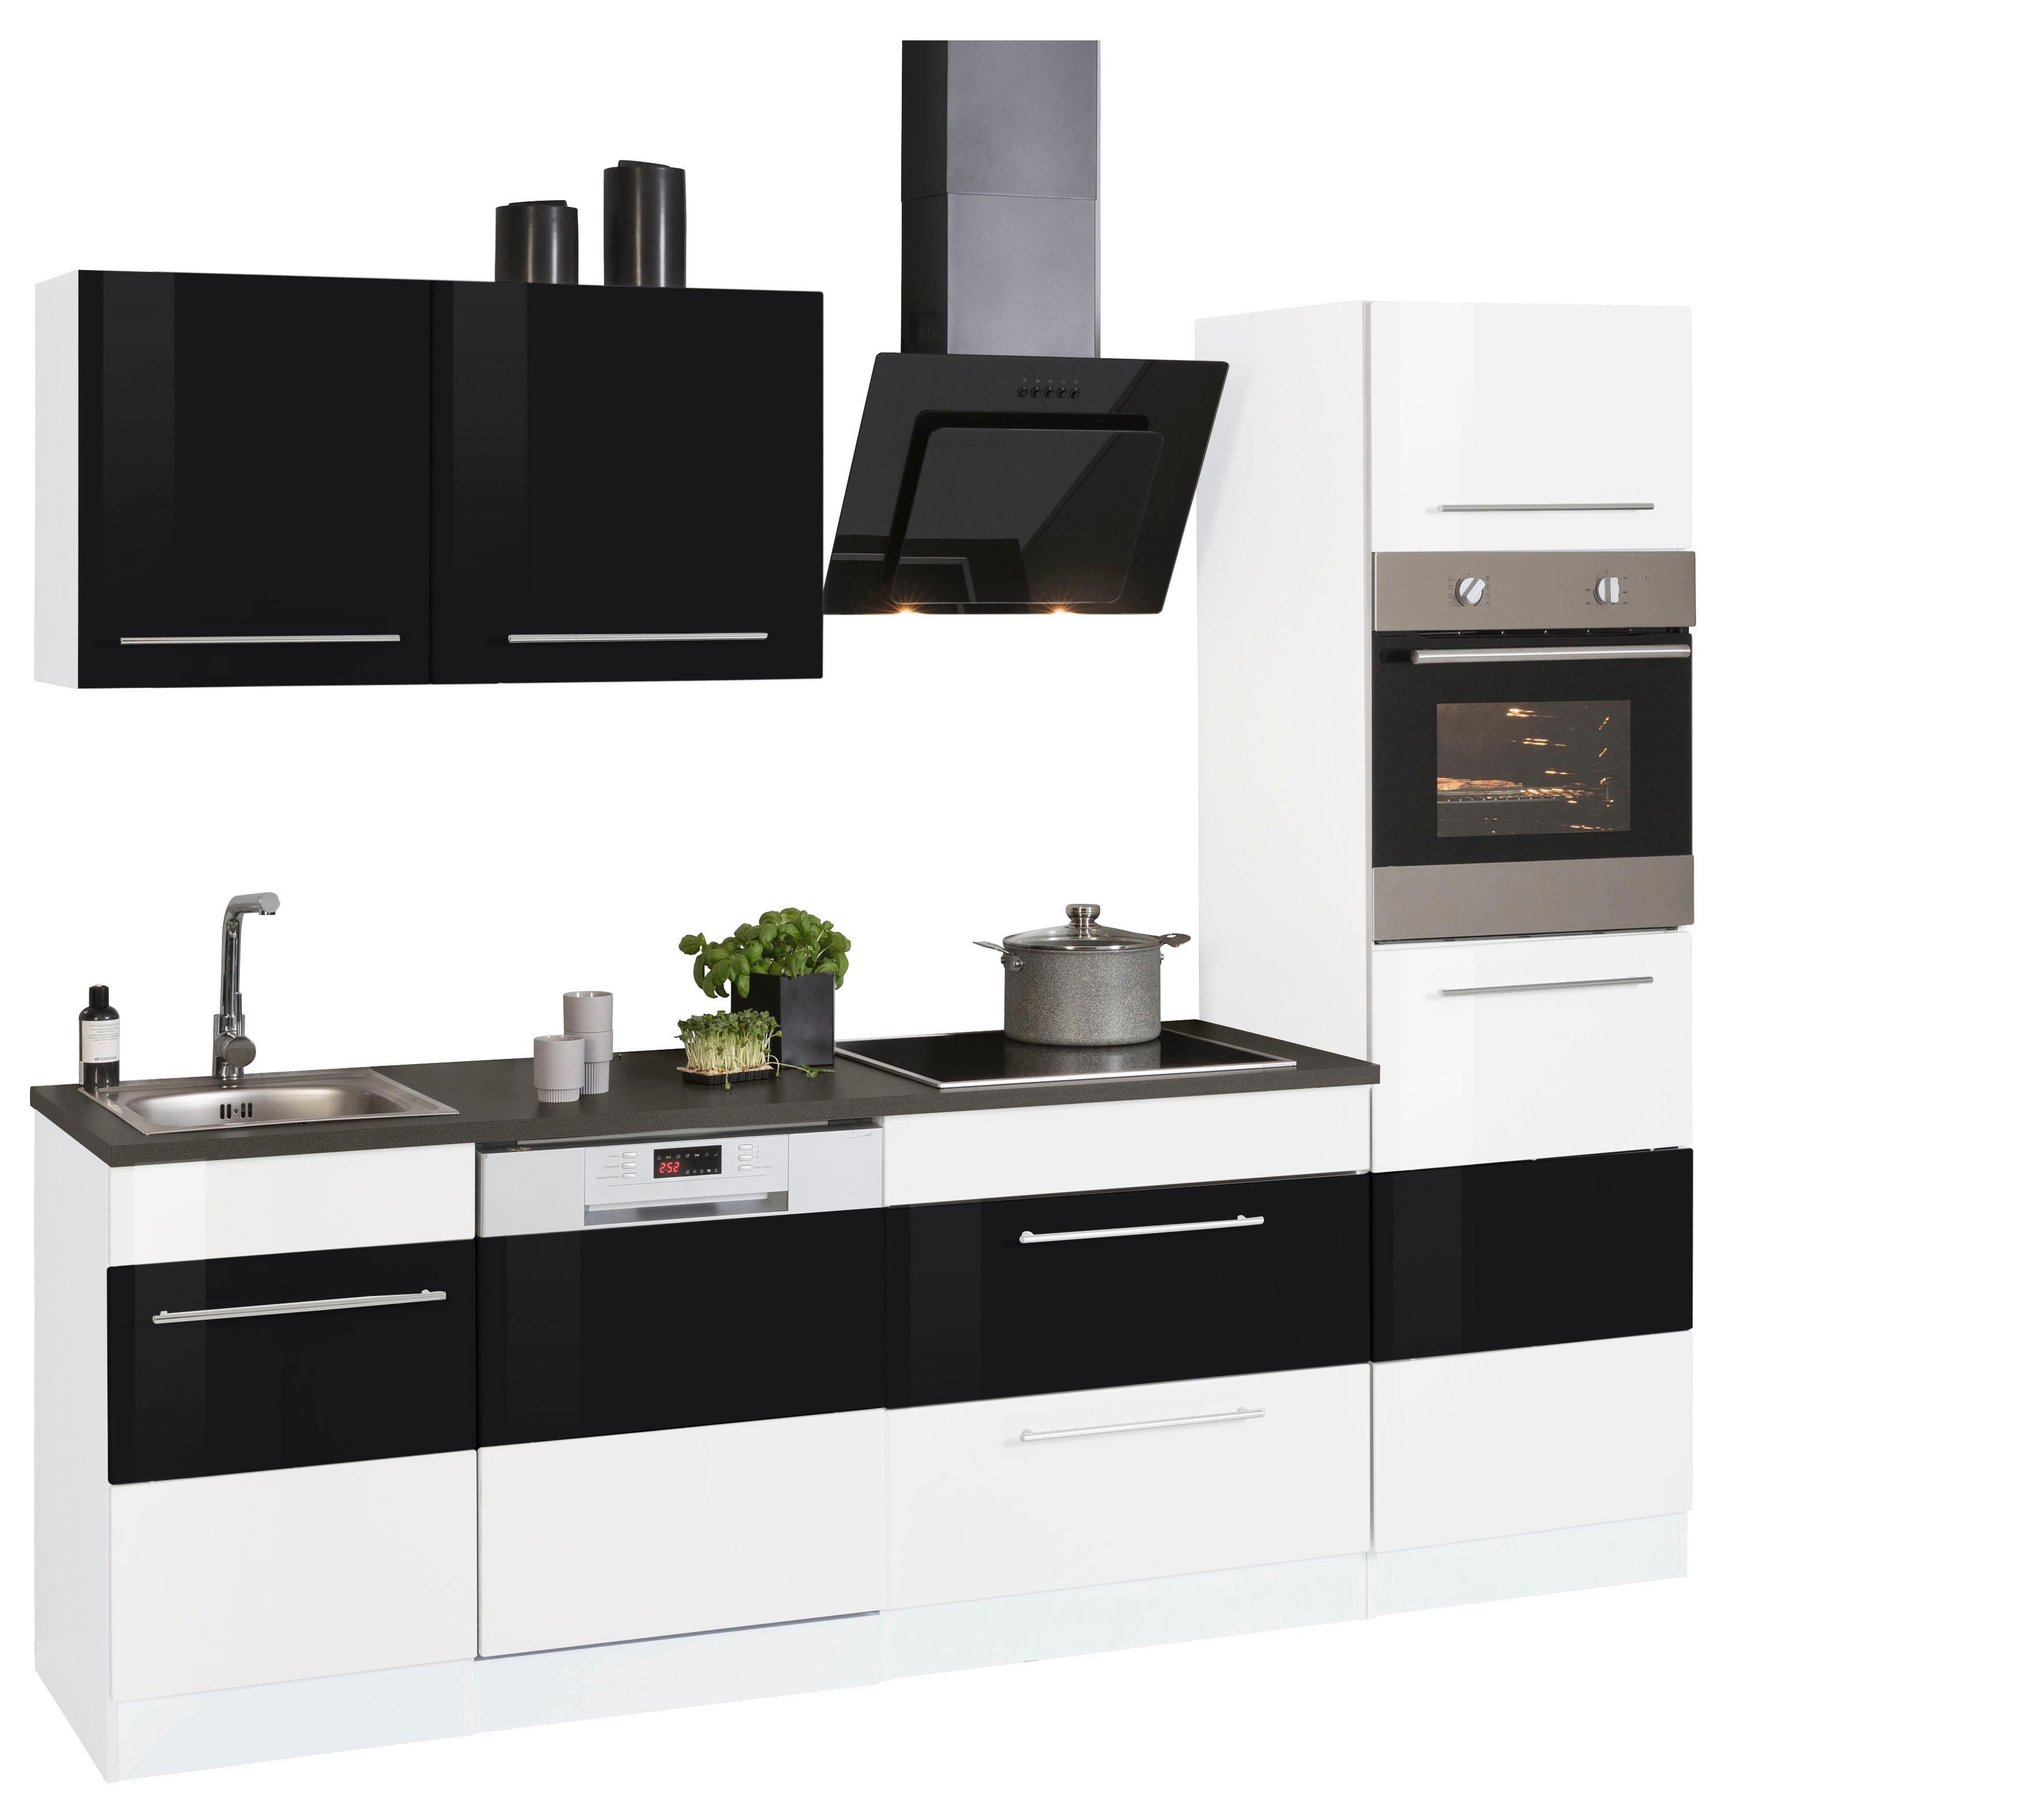 held m bel k chenzeile trient ohne e ger te breite 250. Black Bedroom Furniture Sets. Home Design Ideas